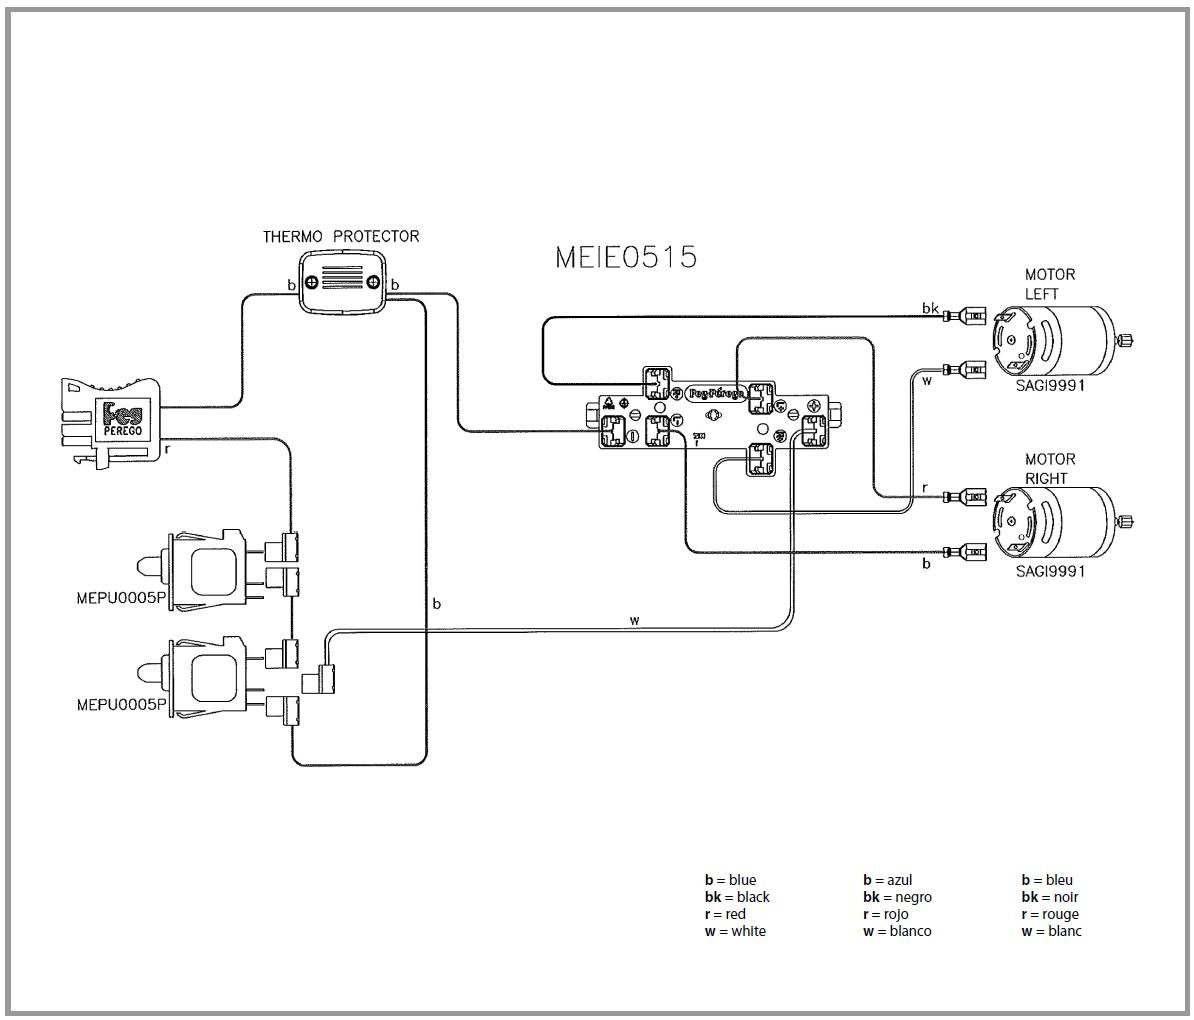 12v winch solenoid del Schaltplan